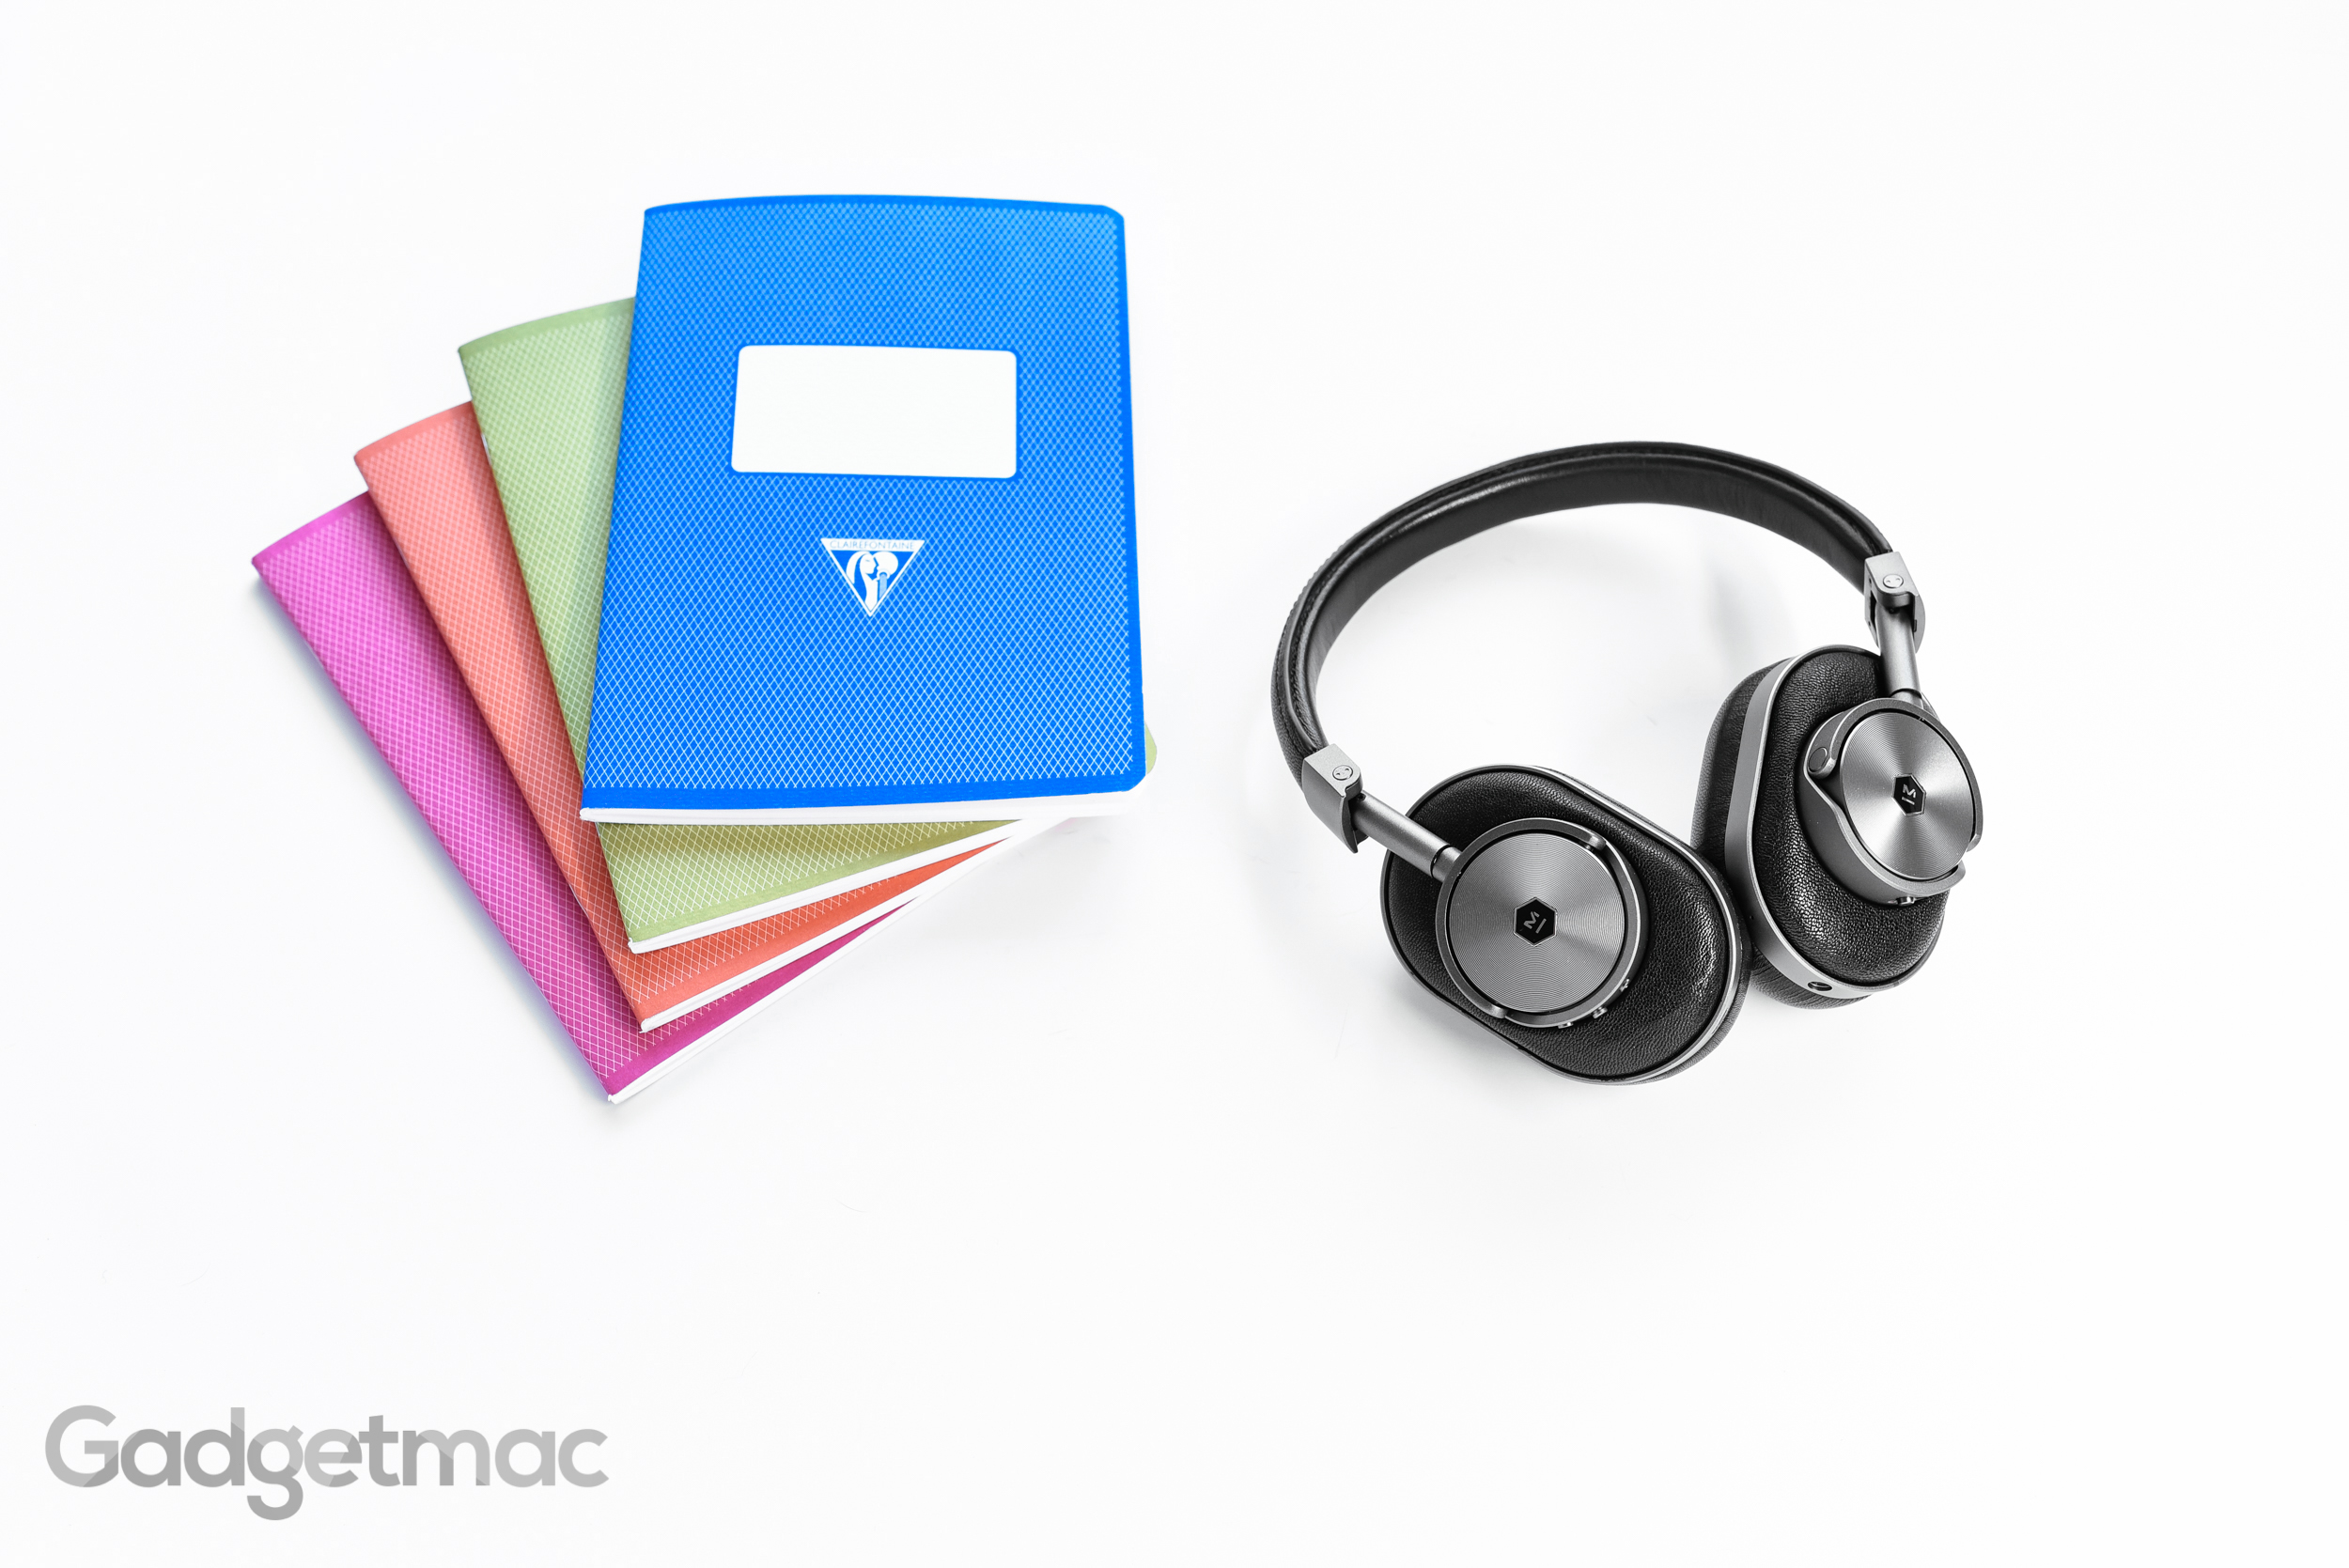 mw60-wireless-over-ear-headphones.jpg